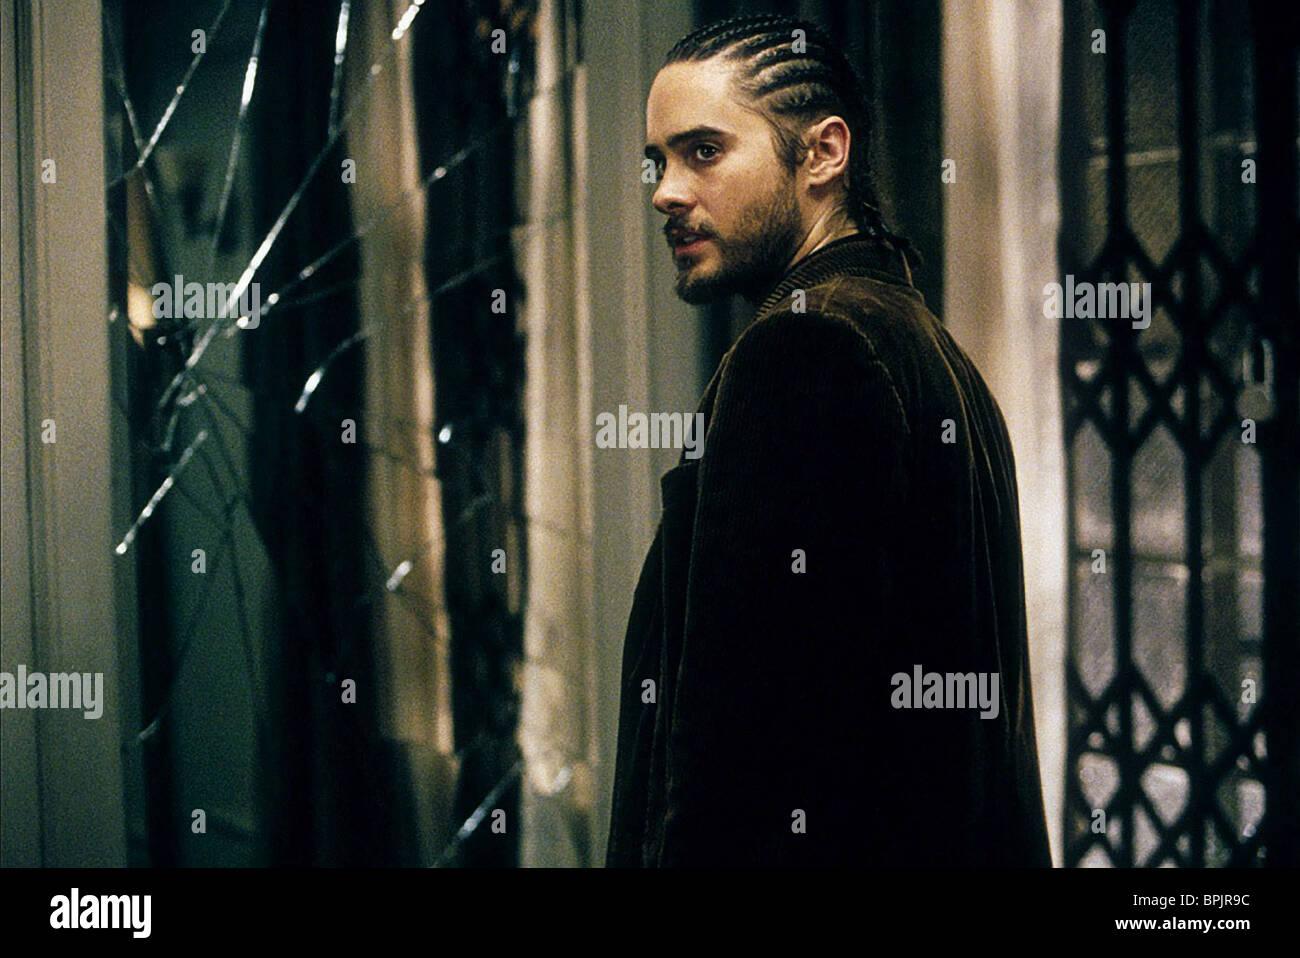 Jared Leto Panic Room 2002 Stock Photo Alamy